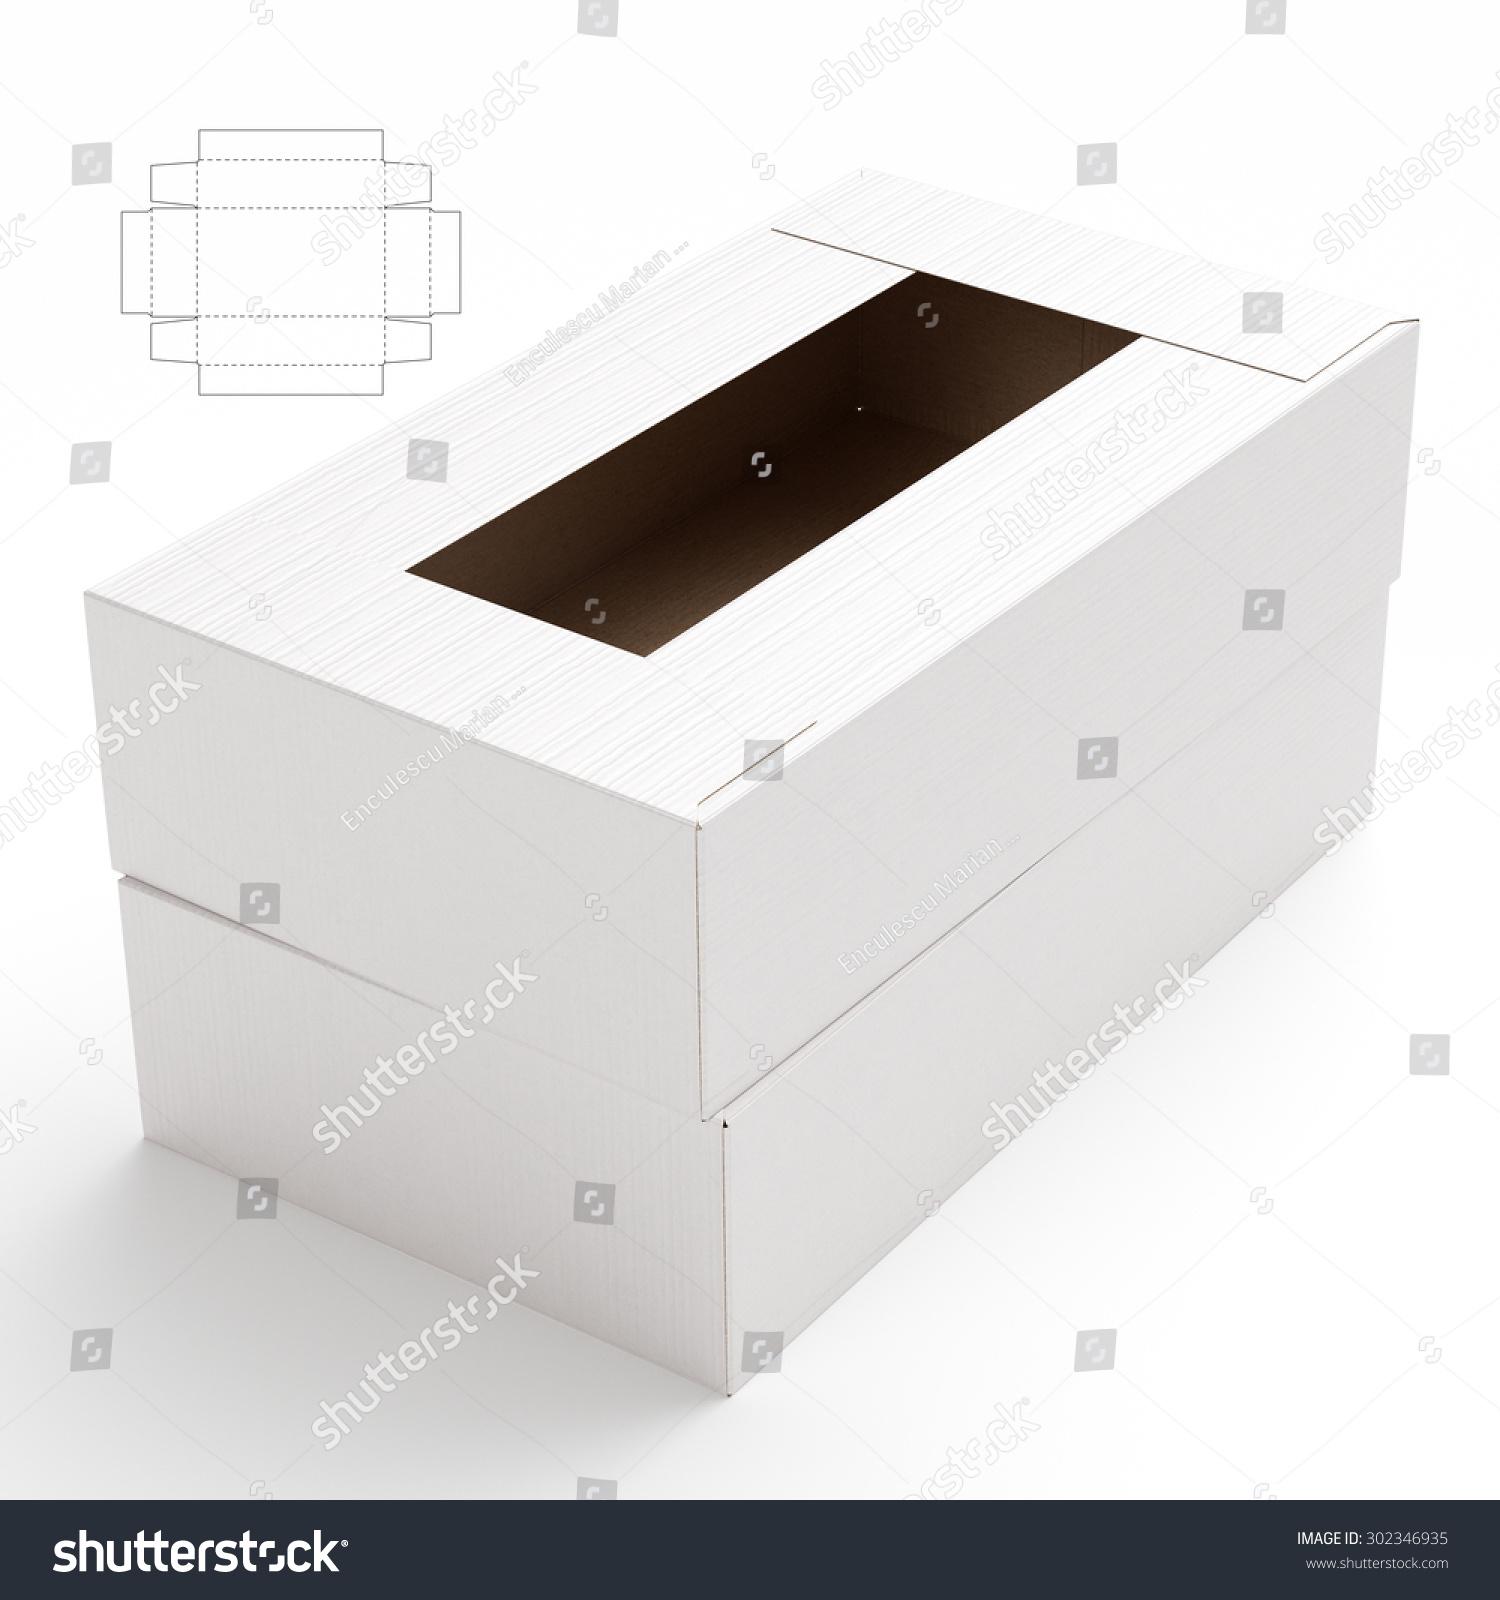 Storage box with Blueprint Template  sc 1 st  Shutterstock & Storage Box Blueprint Template Stock Illustration 302346935 ...